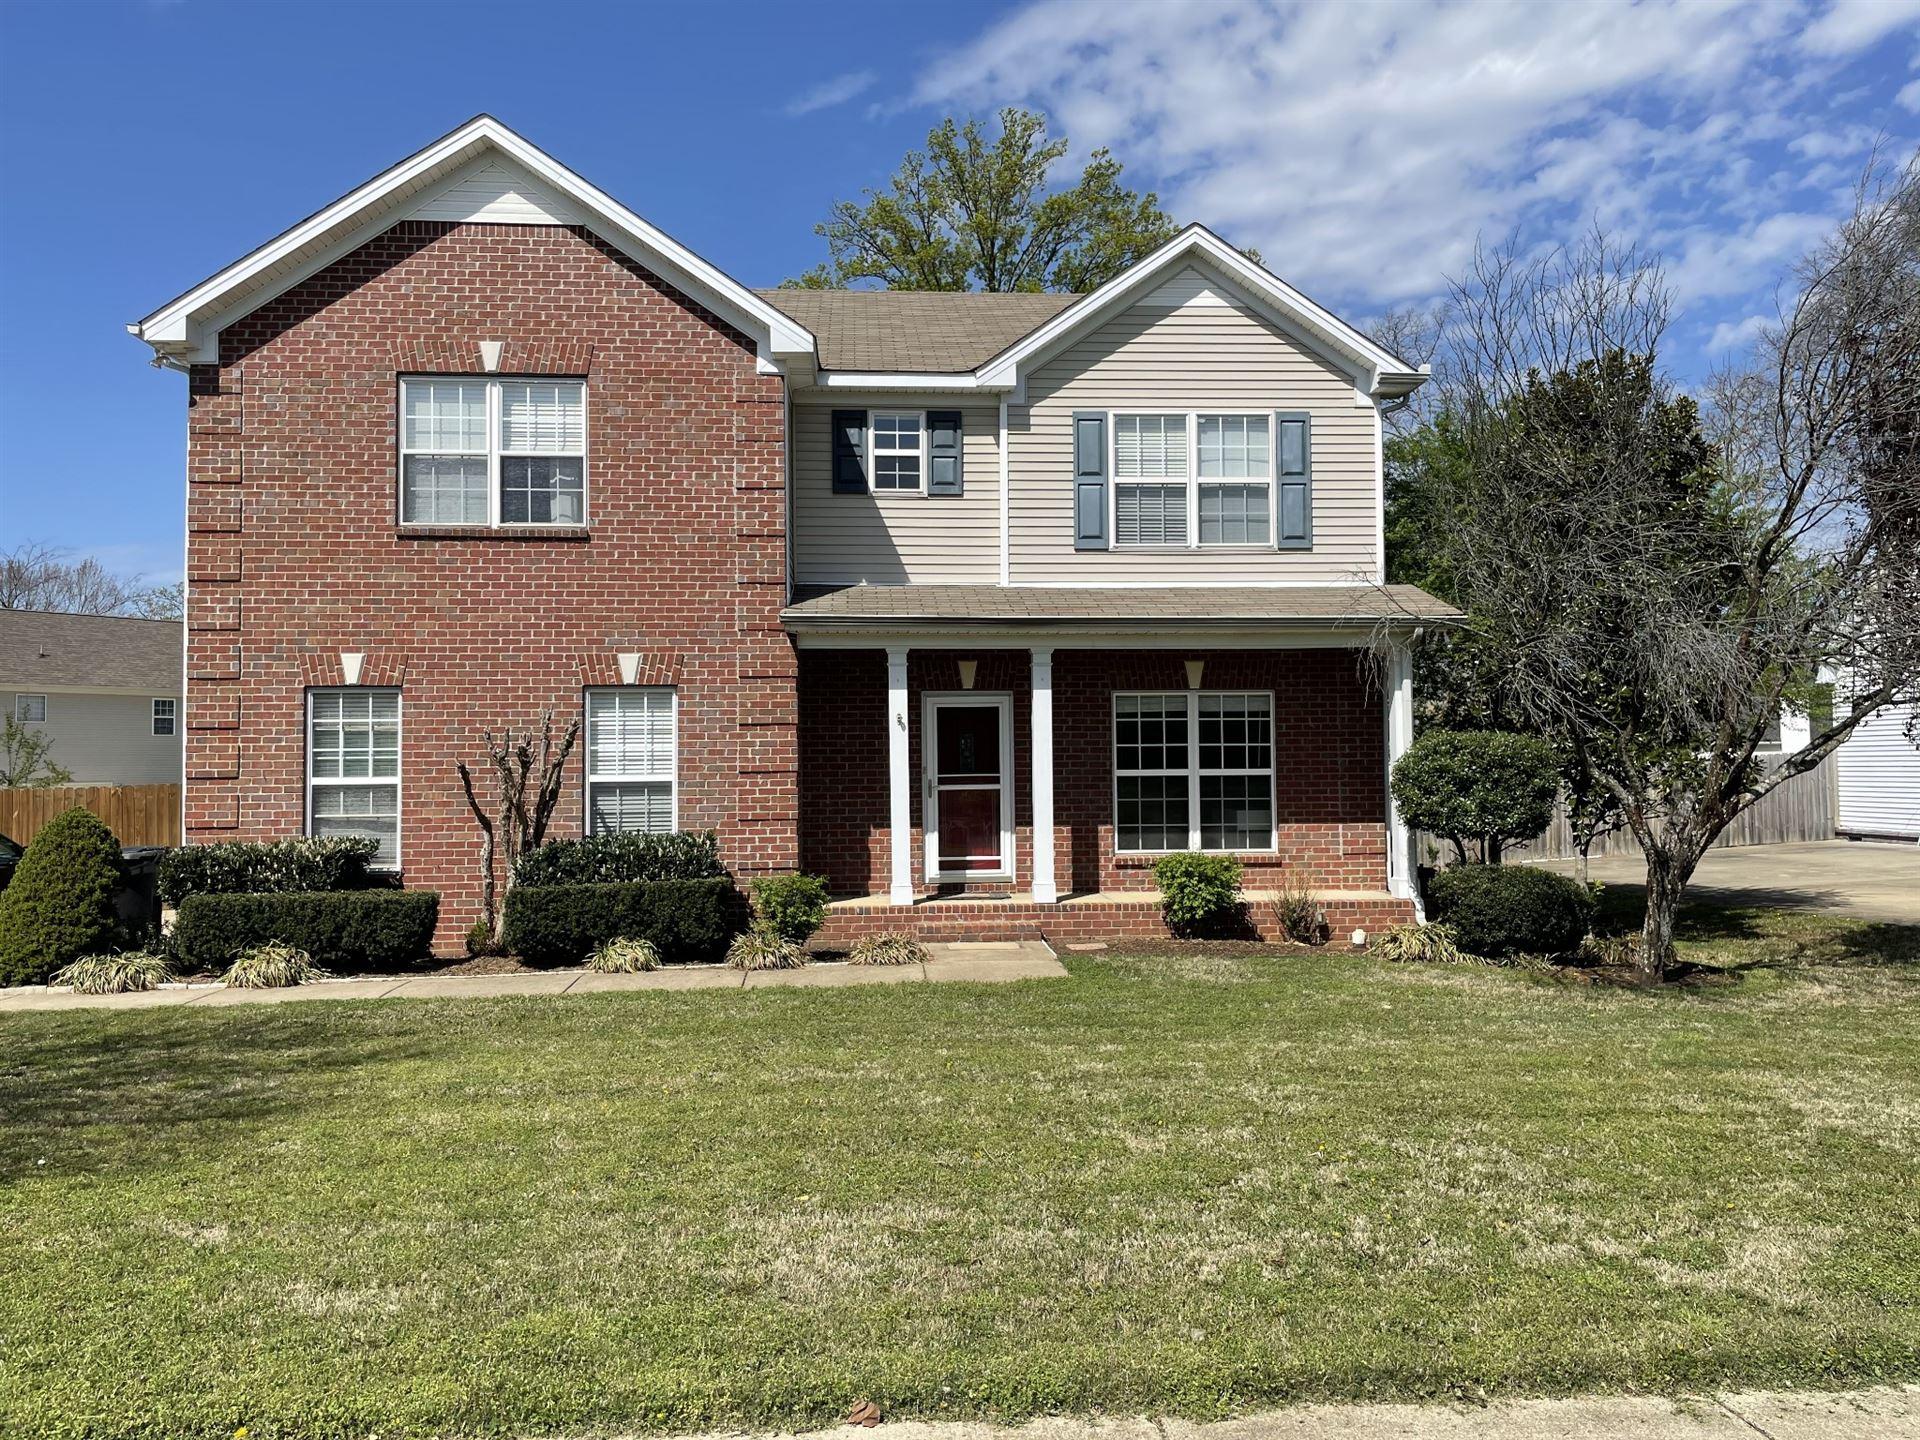 Photo of 1738 Kinsale Ave, Murfreesboro, TN 37128 (MLS # 2244150)